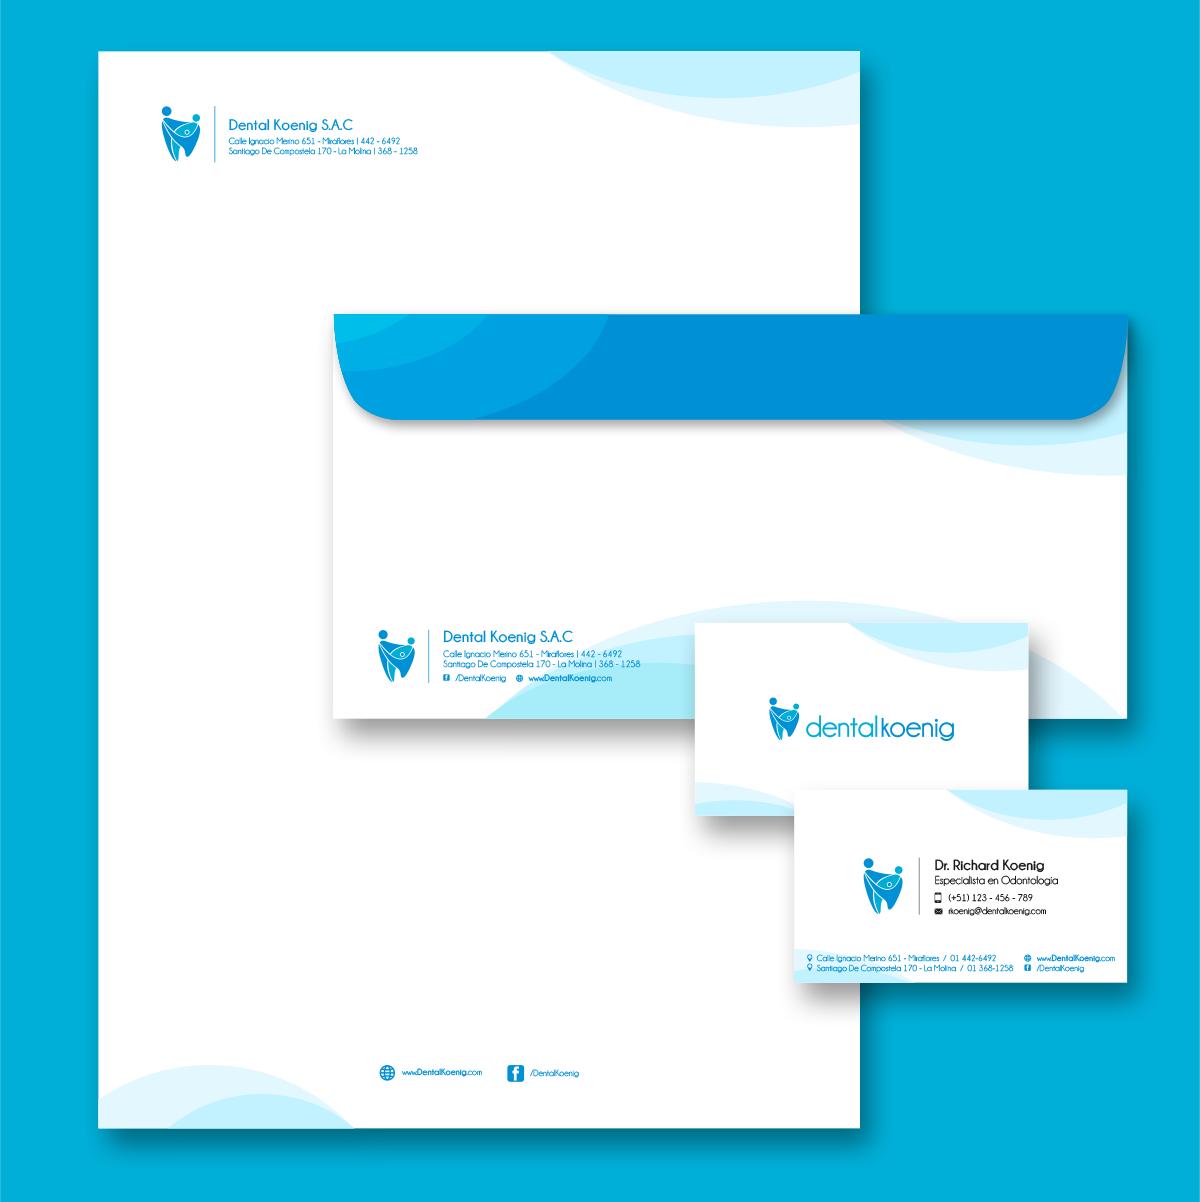 Logotipo Clinica Dental  Dental Koenig branding  Creación de marca